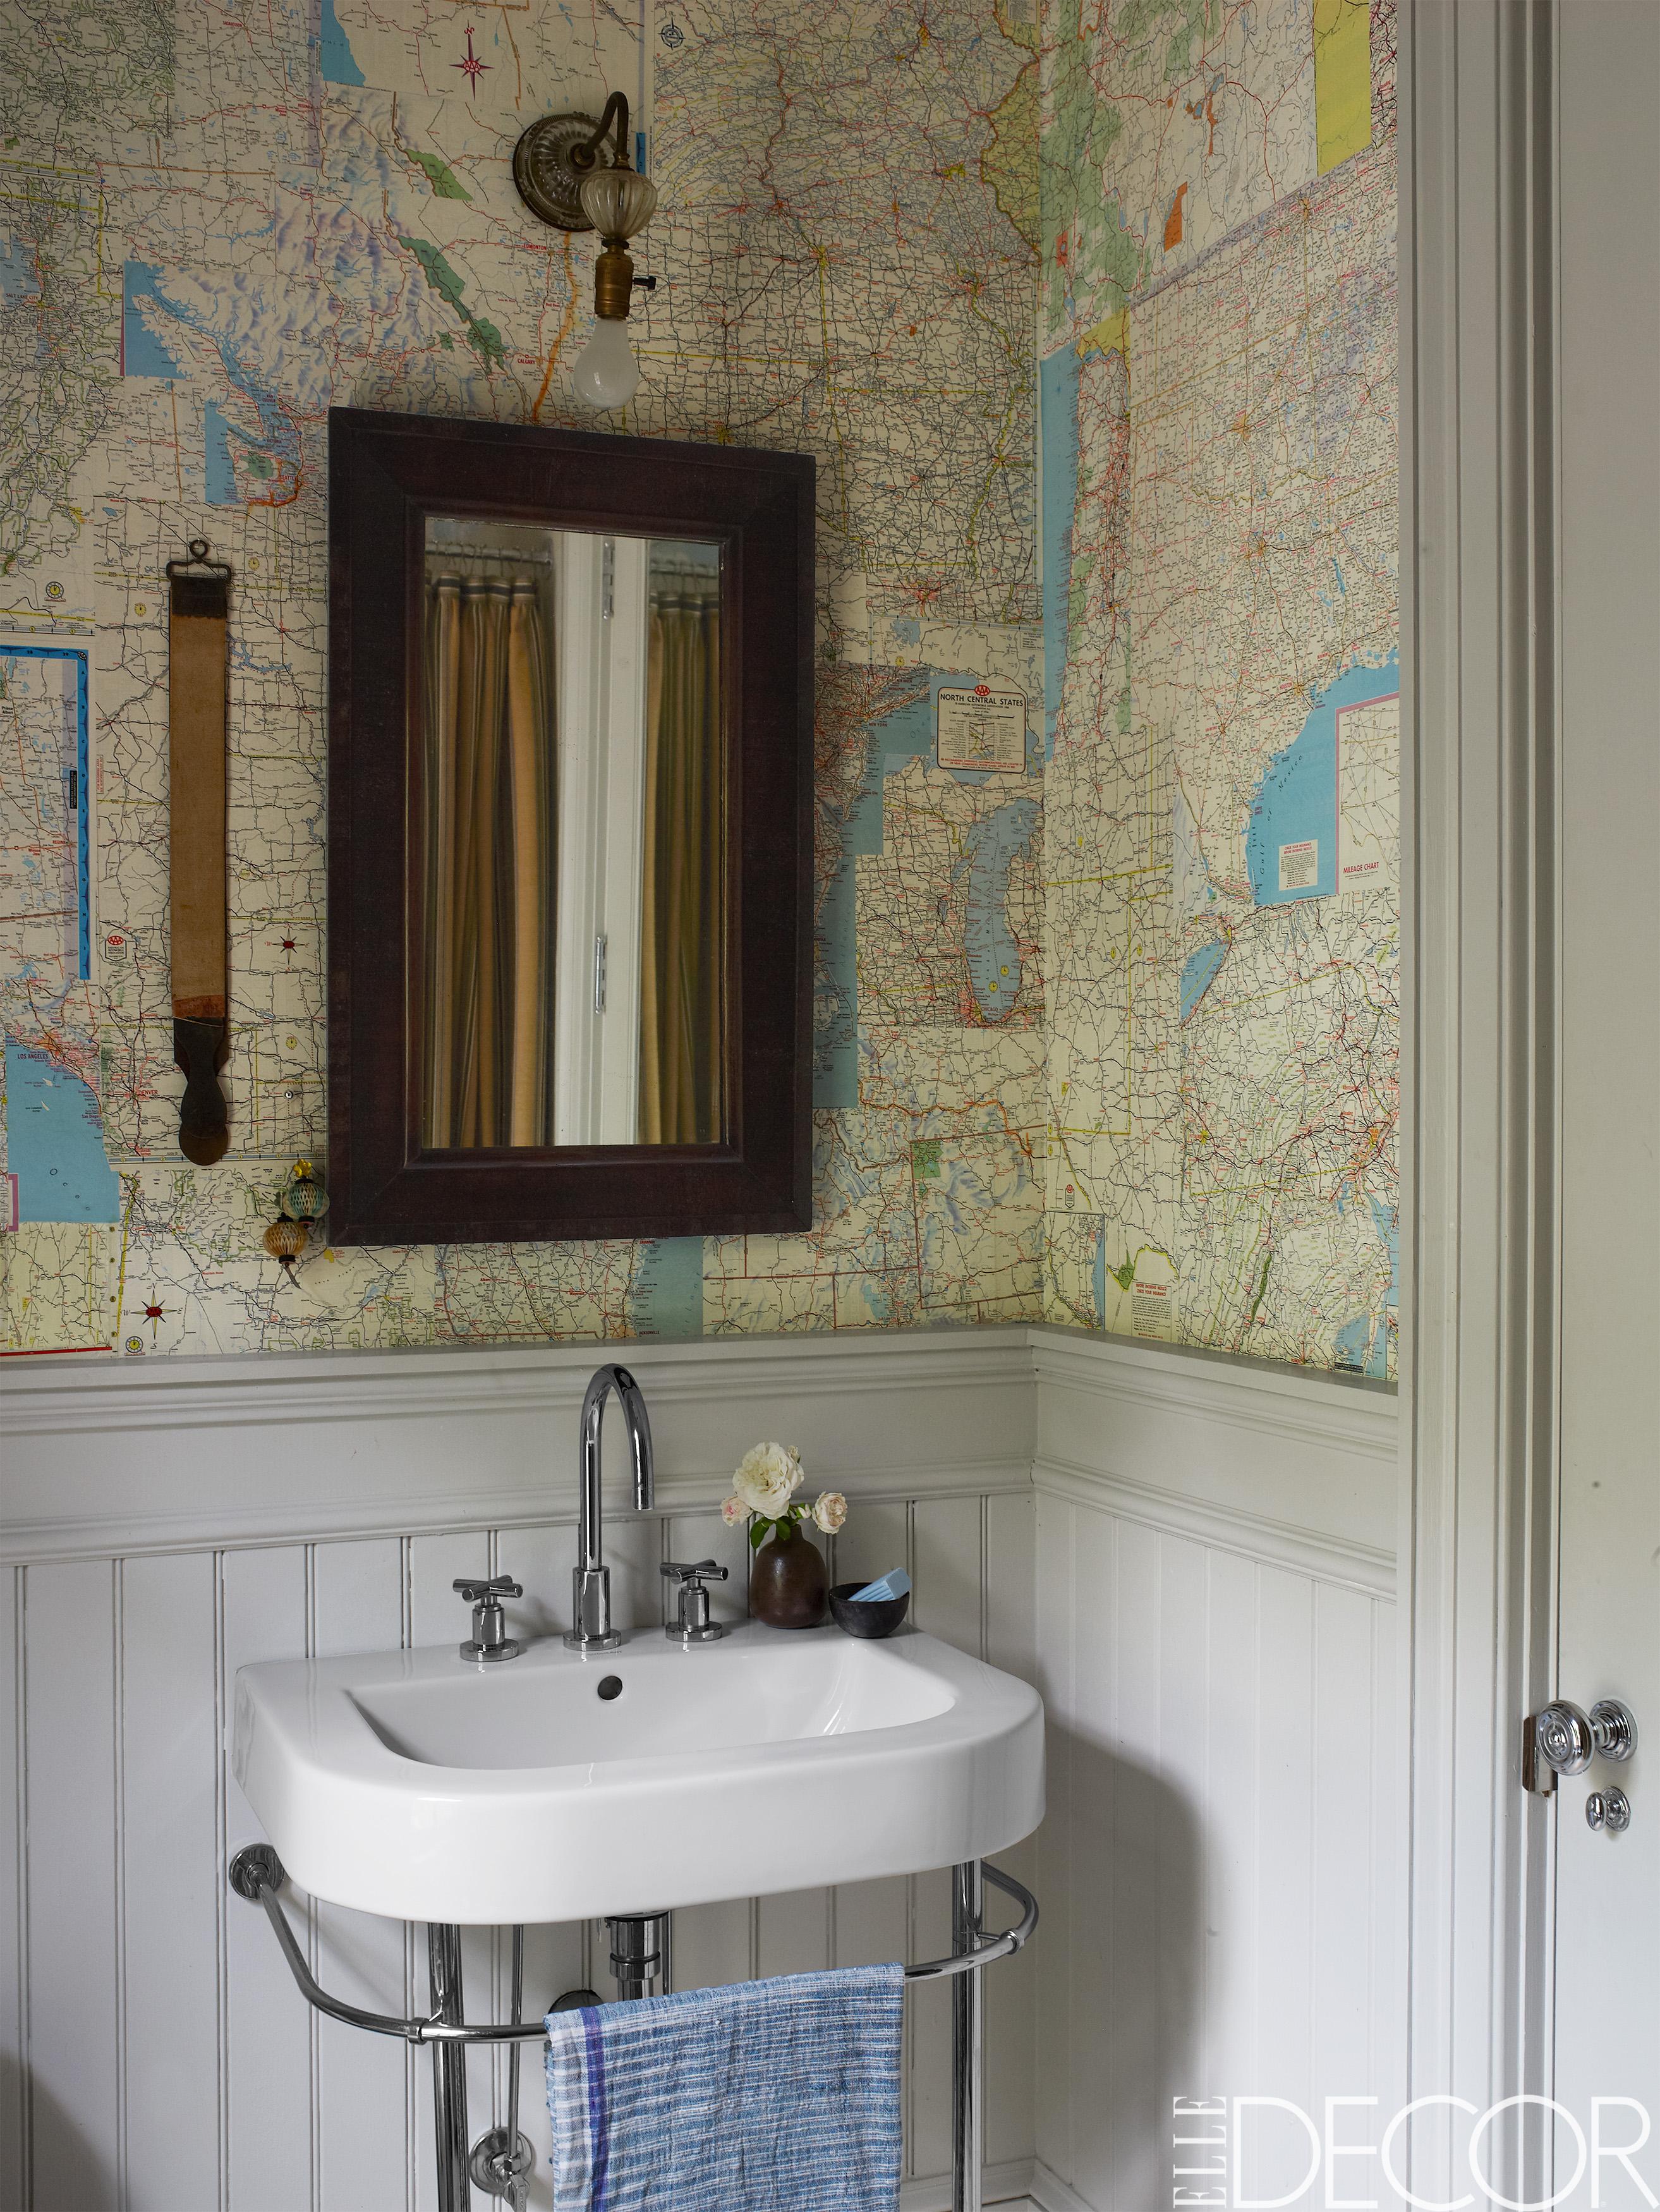 small bathroom sinks 20 best bathroom sink design ideas - stylish designer bathroom sinks GWABGMX